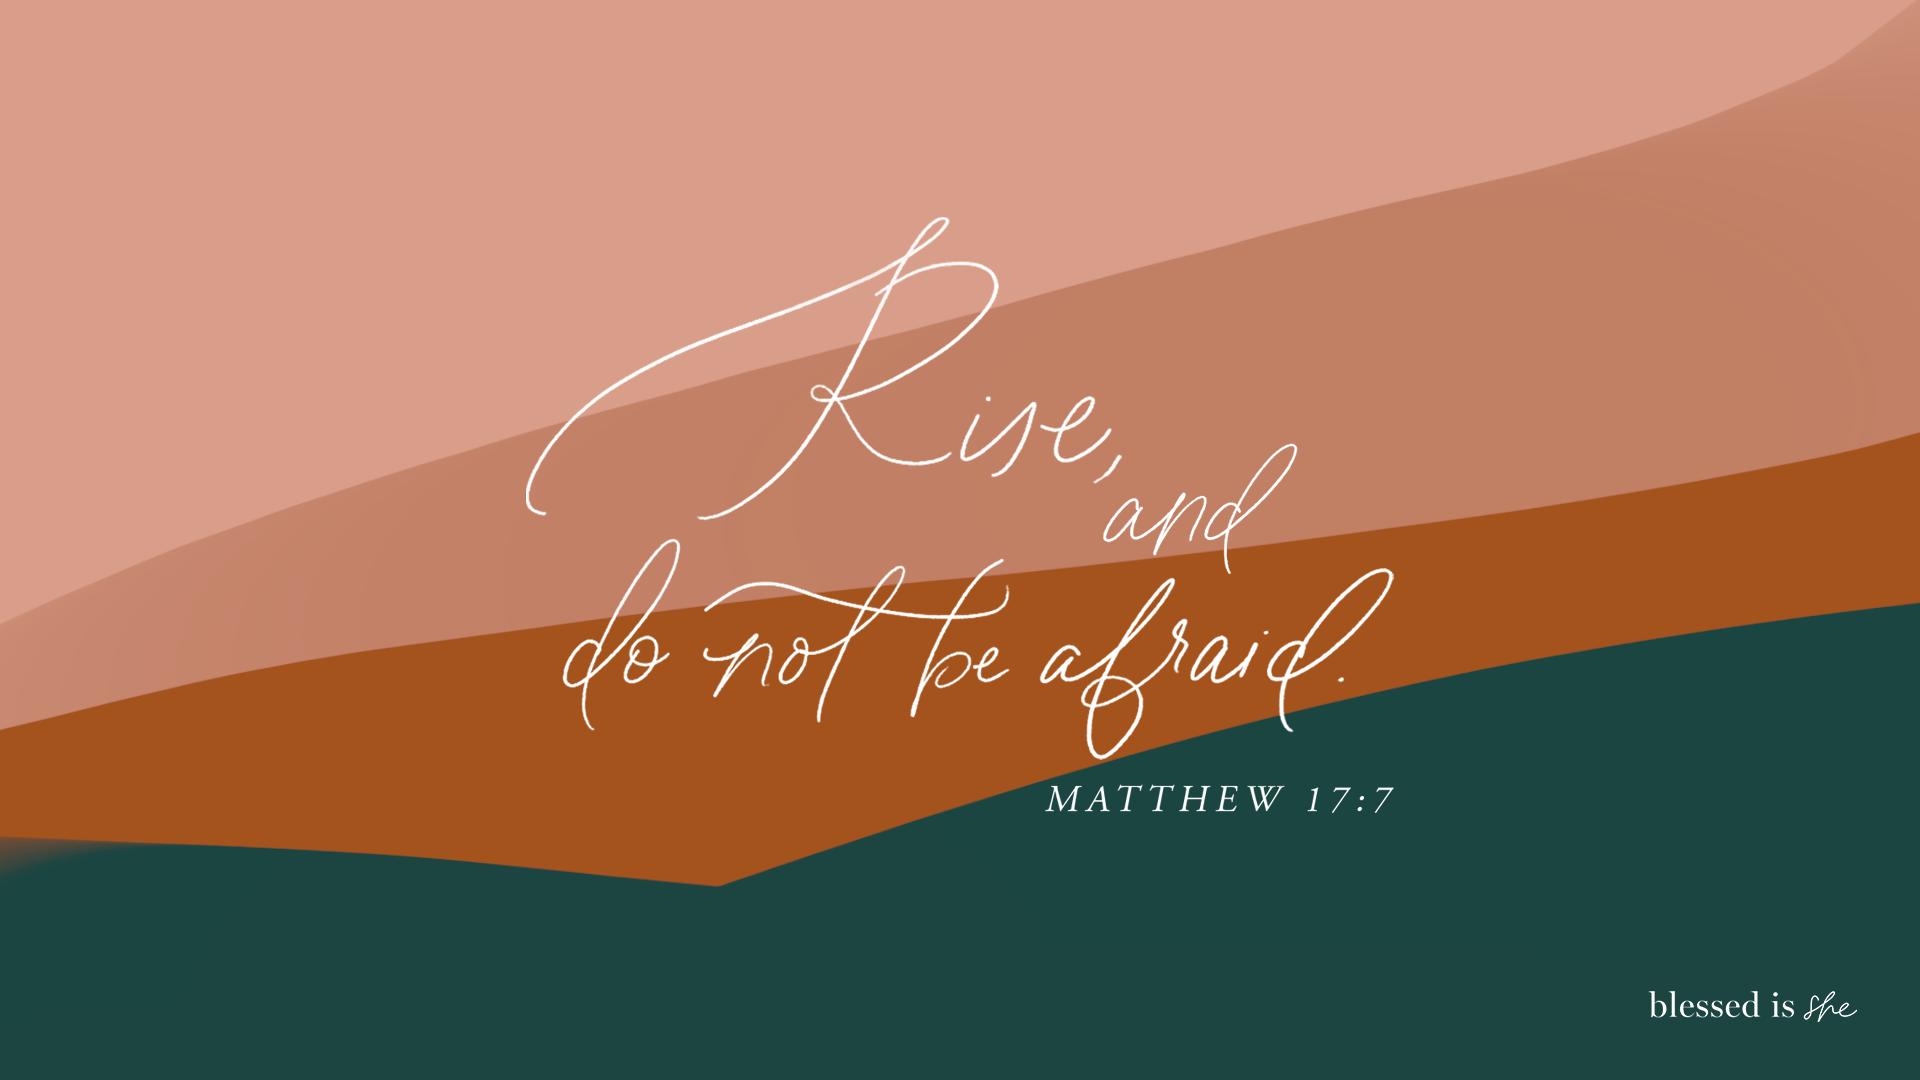 Cool Bible Verse Desktop Backgrounds